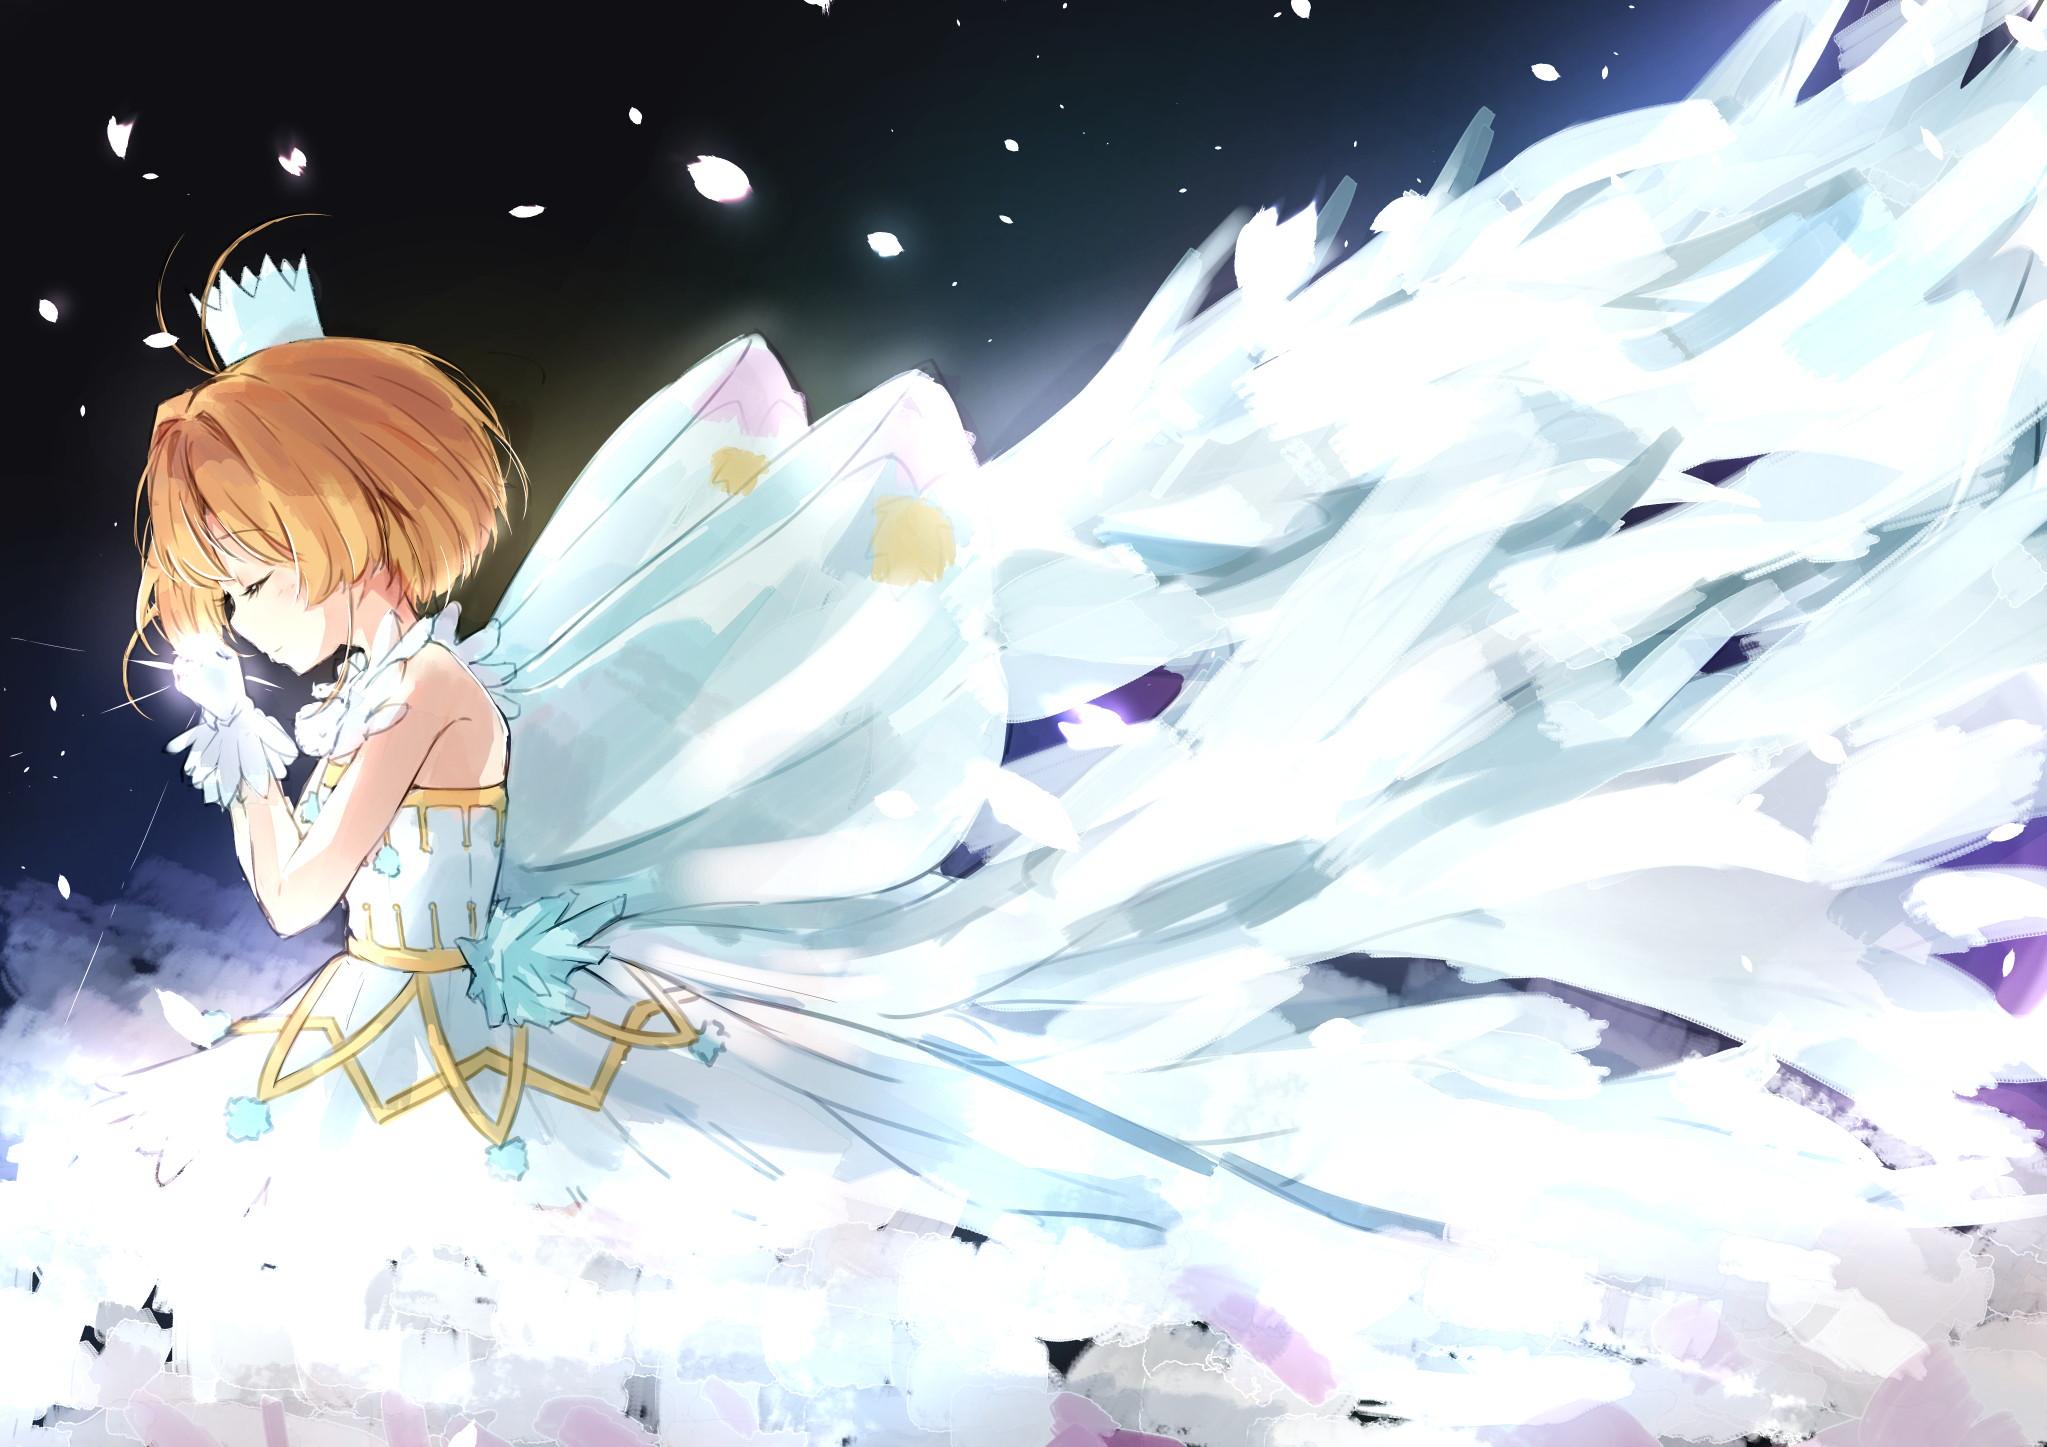 download ảnh đẹp của Sakura